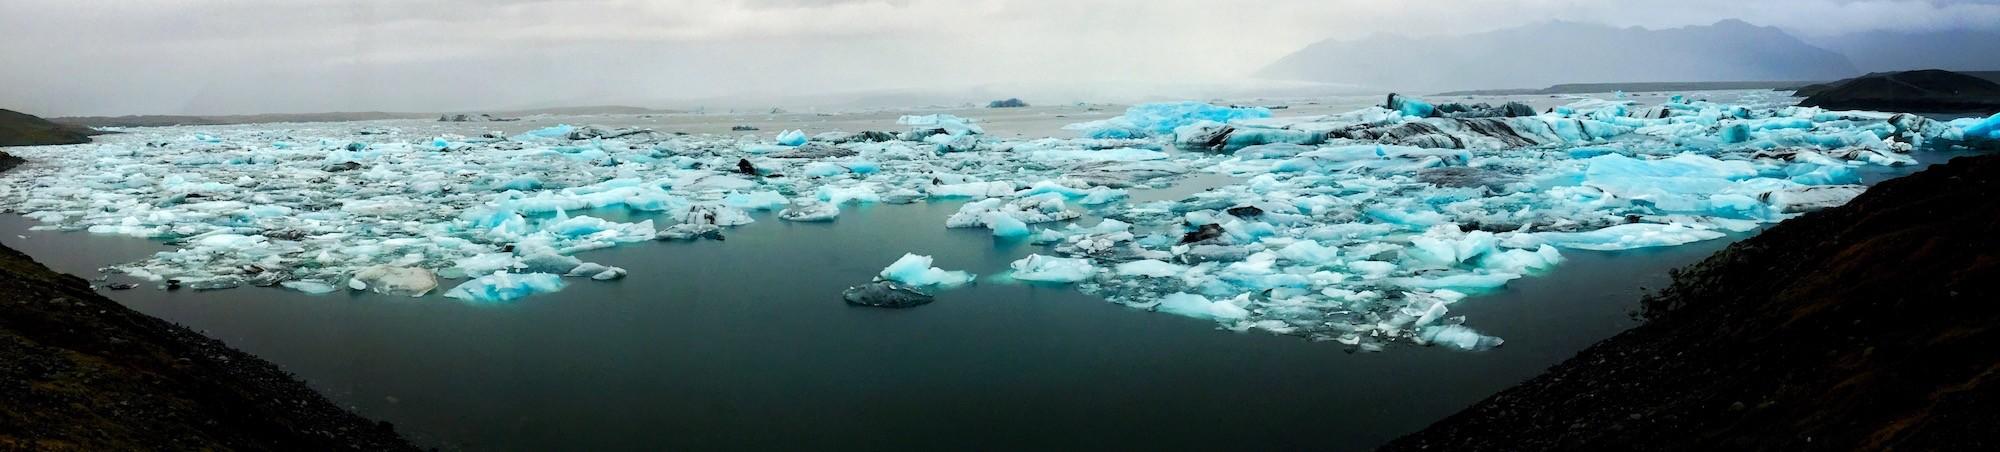 Jokulsarlon-Glacier-Lagoon-Iceland-Header